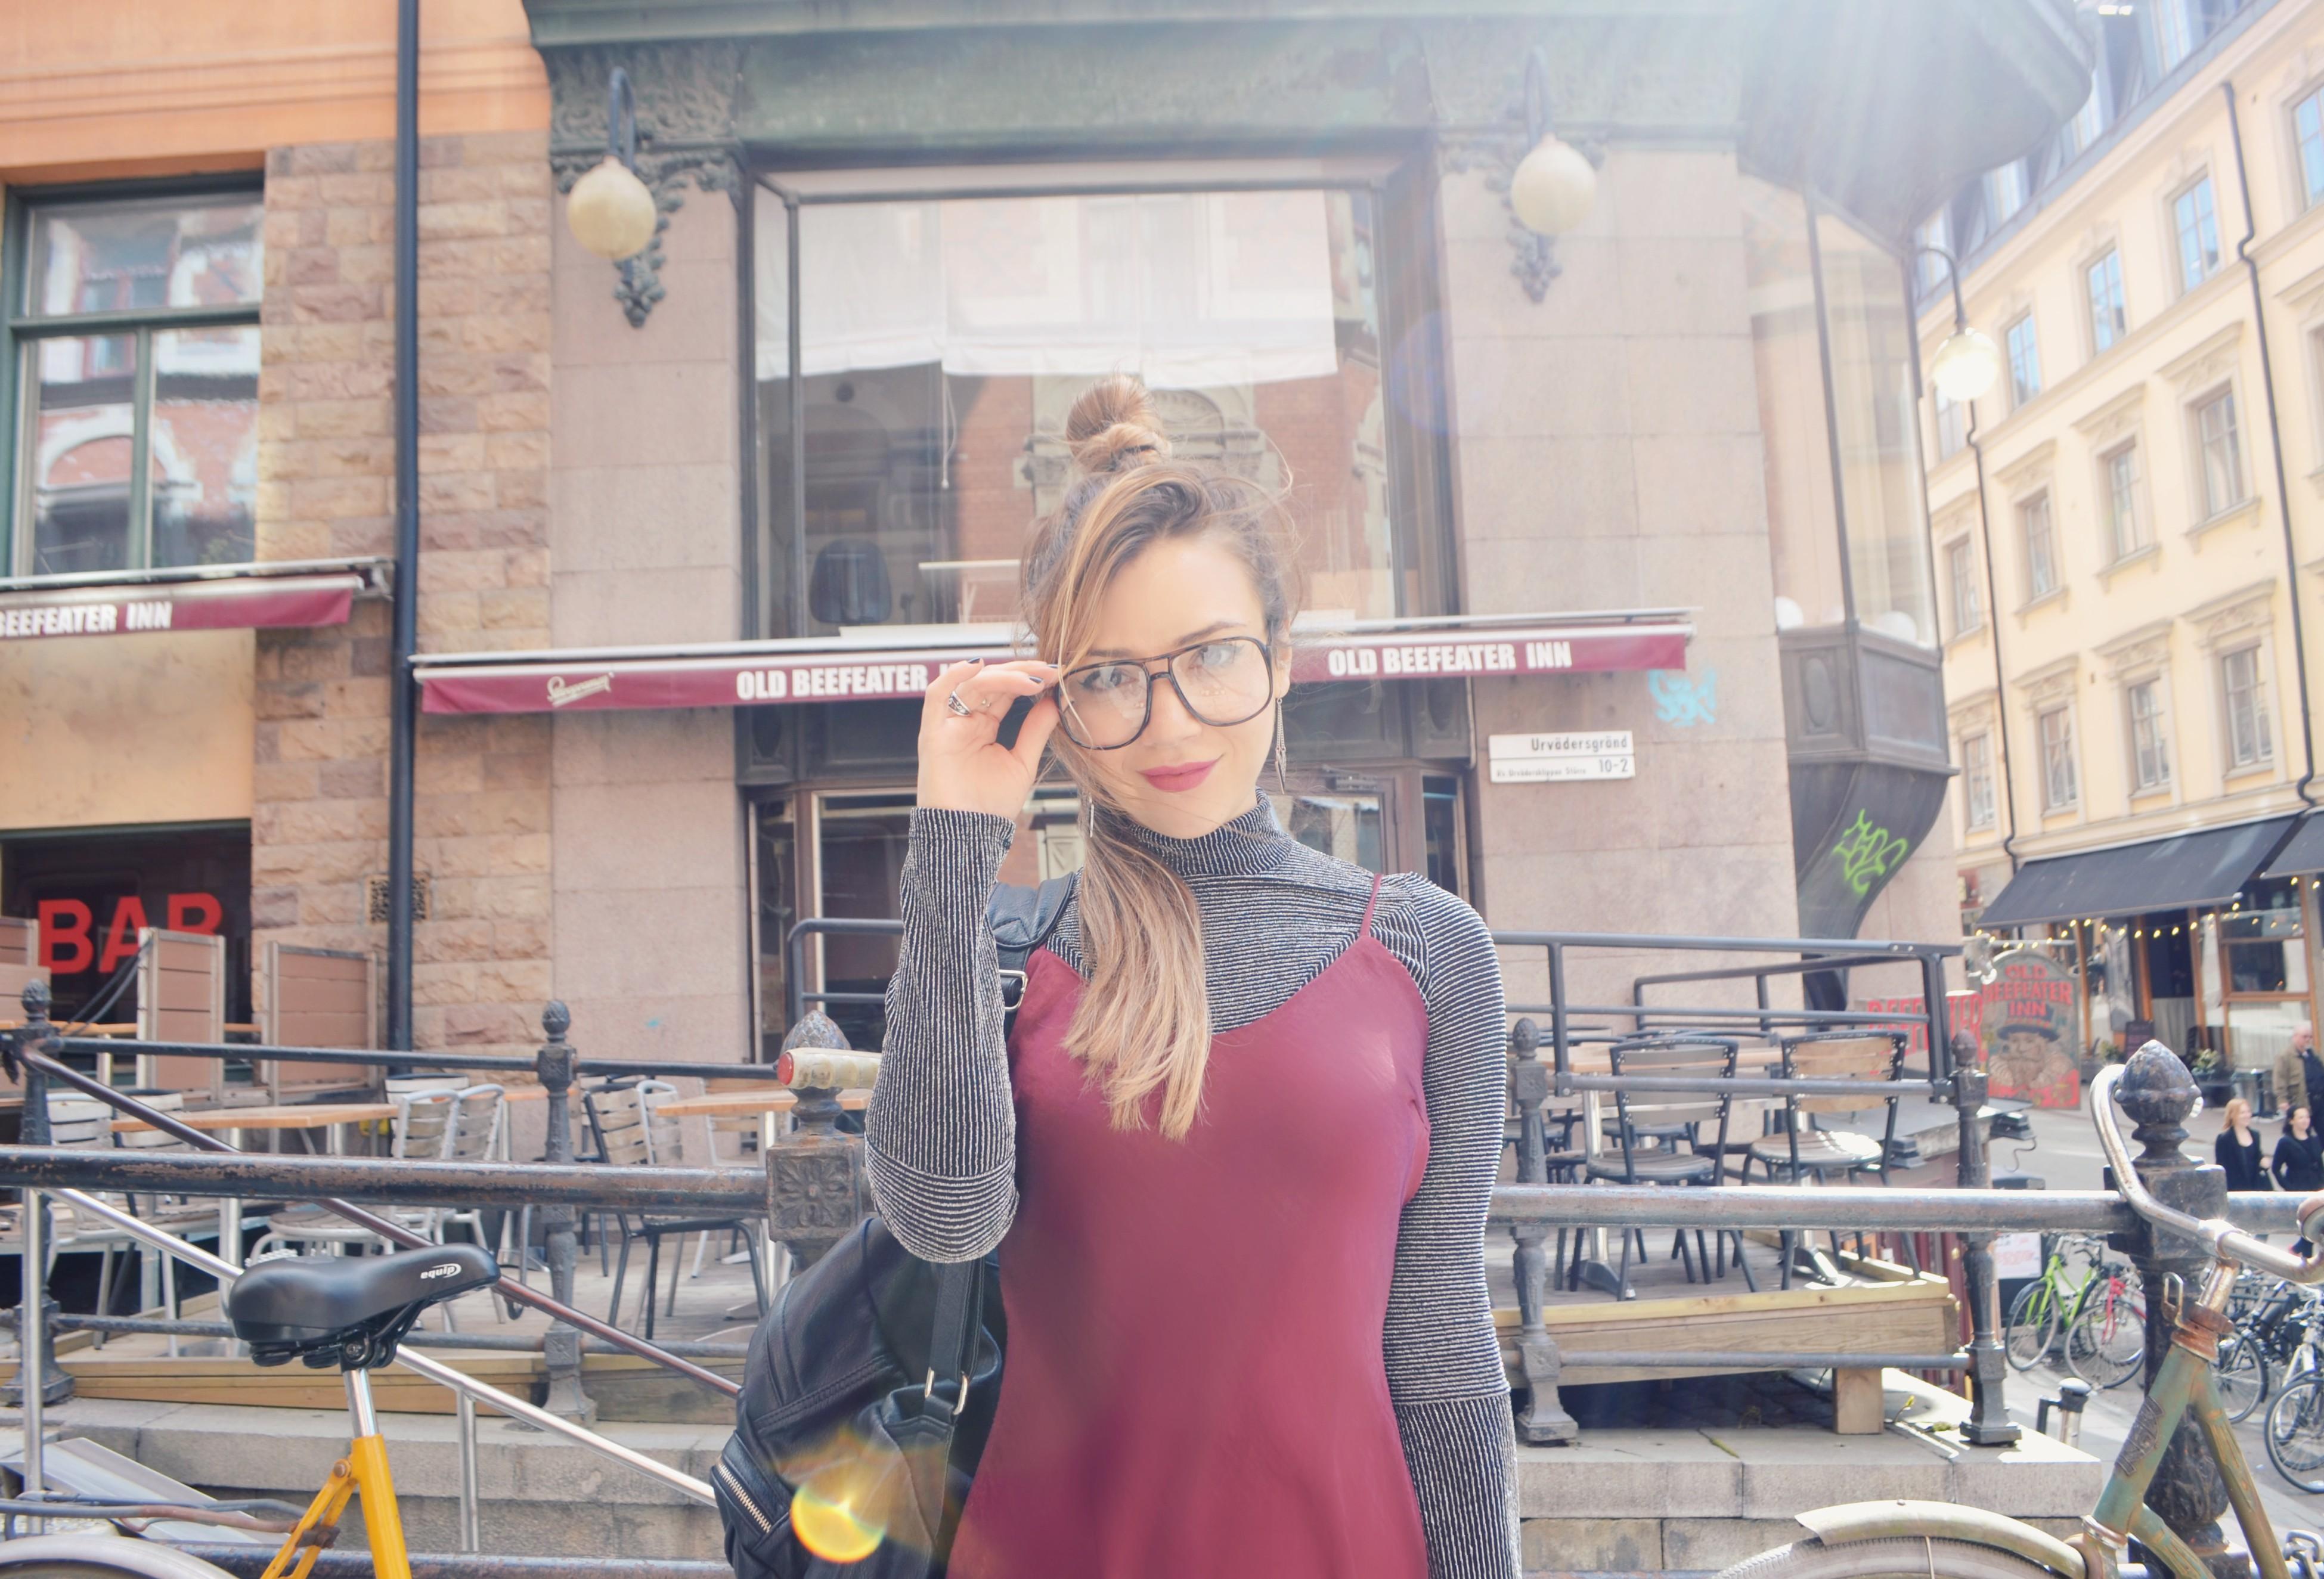 Fashionista-blog-de-moda-ChicAdicta-influencer-Chic-Adicta-burgundy-look-gafas-retro-bershka-style-PiensaenChic-Piensa-en-Chic